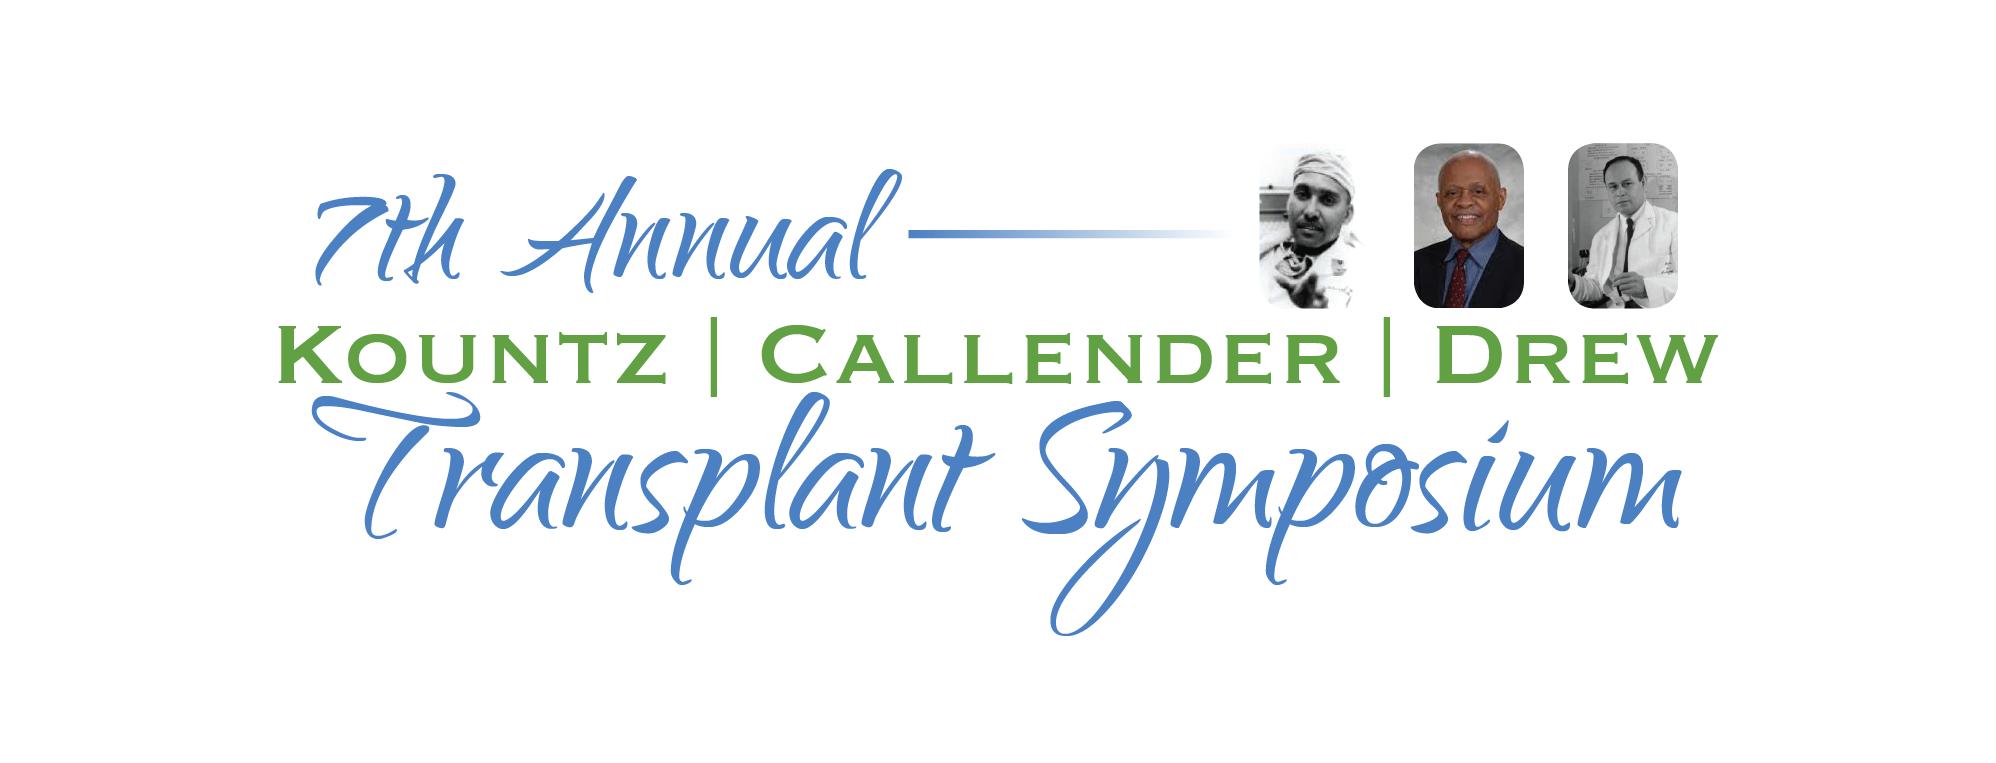 7th Annual Kountz/Callender/Drew Transplant S